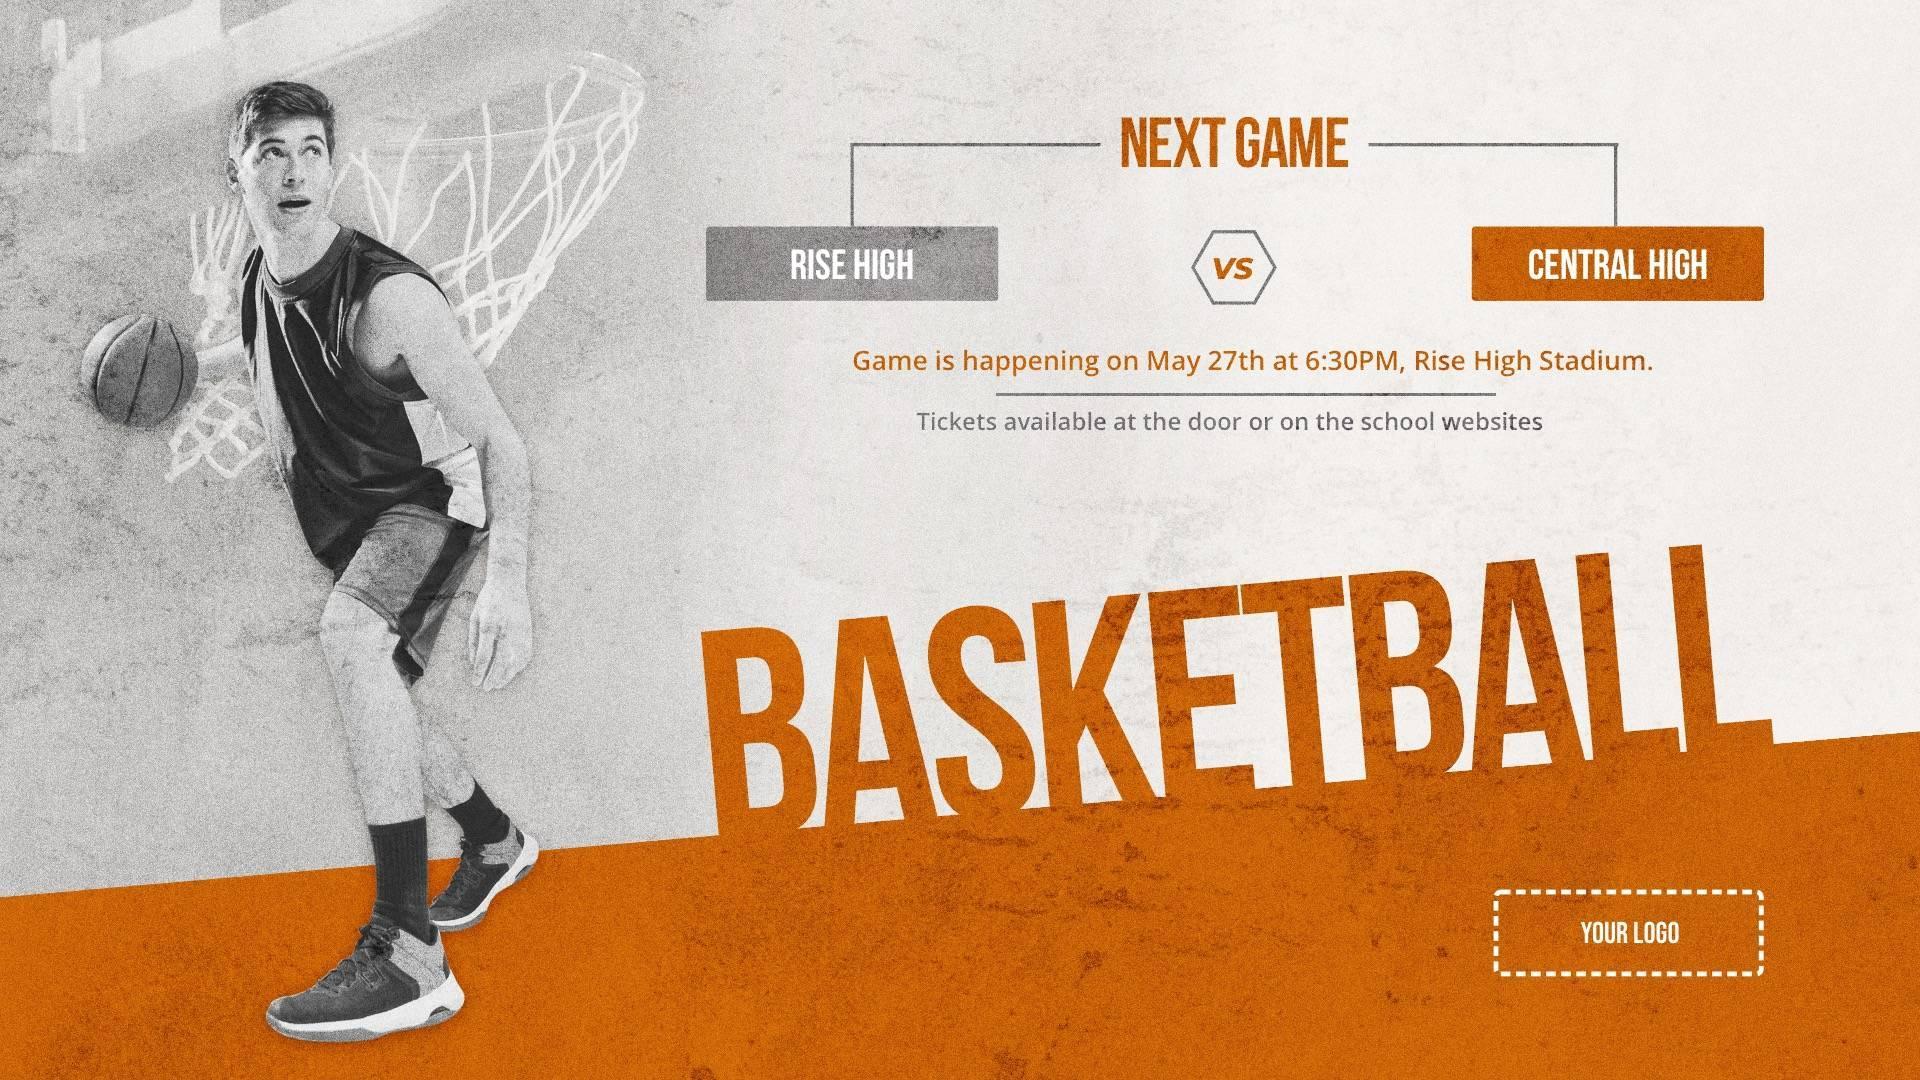 Basketball Game - Sports Digital Signage Template